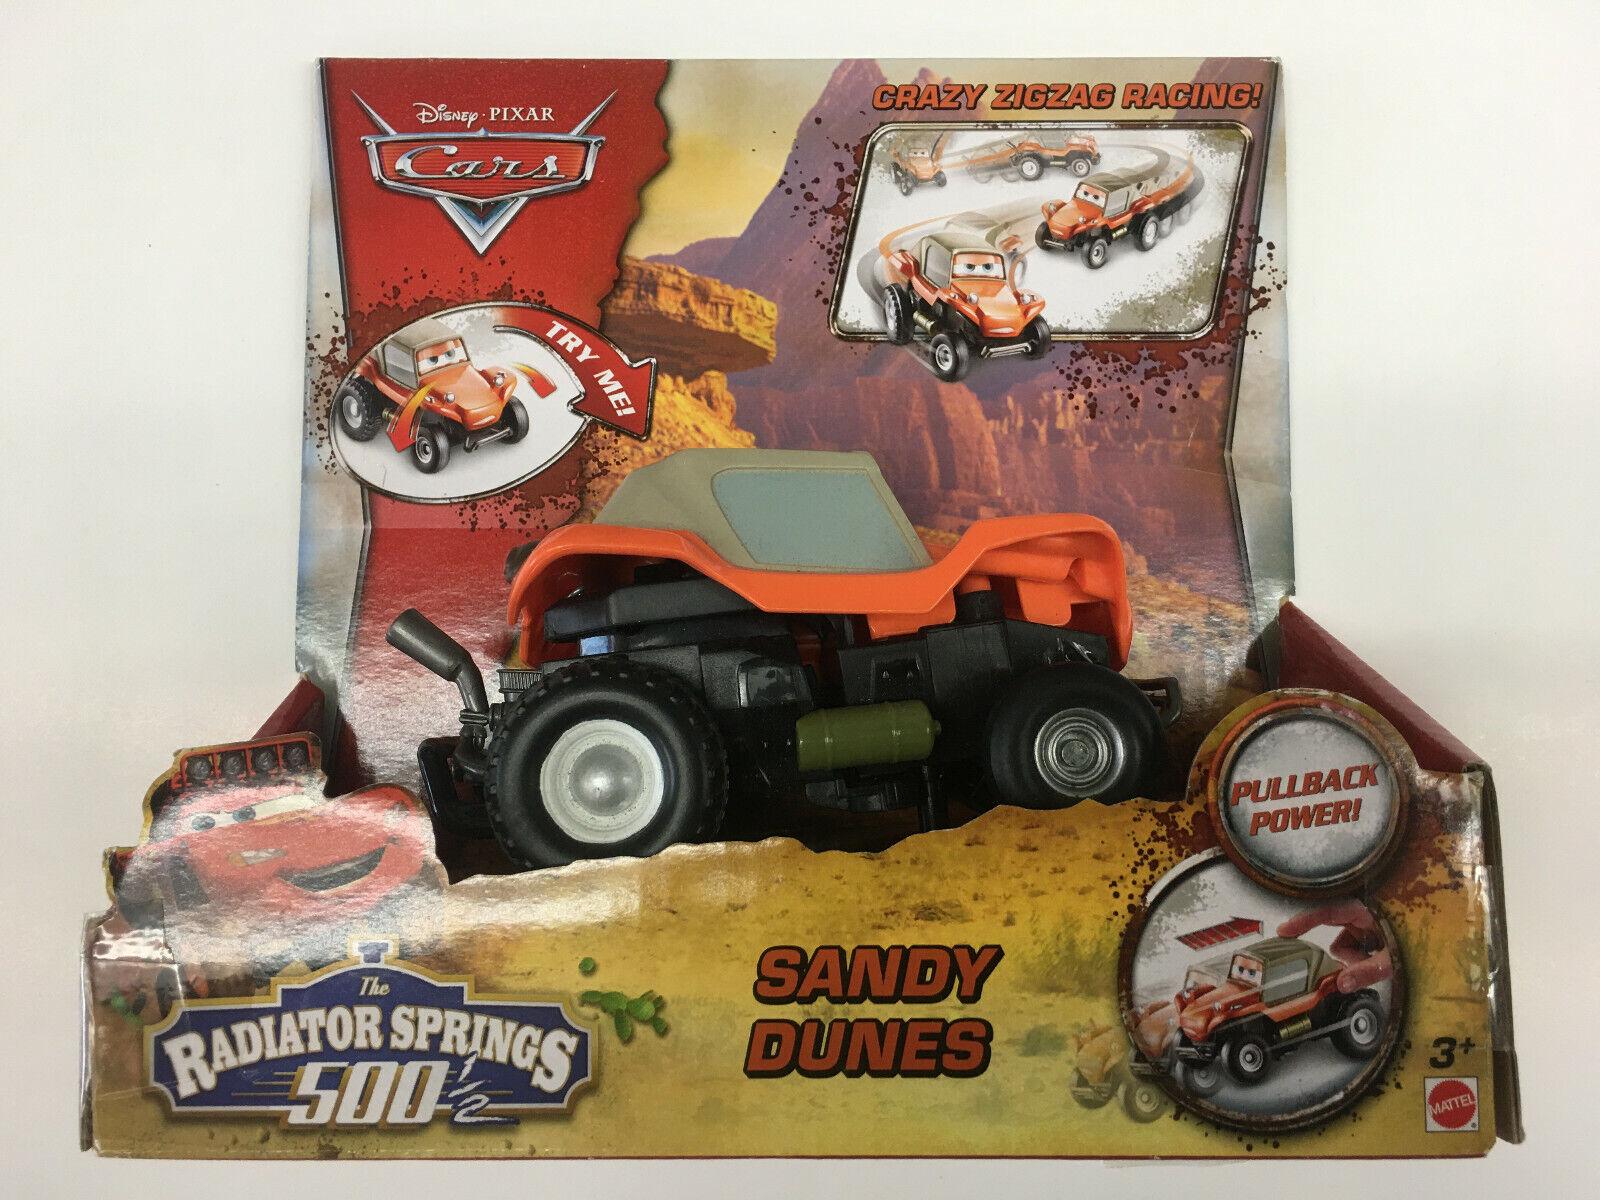 Disney Pixar Cars Radiator Springs 500 Sandy Dunes For Sale Online Ebay